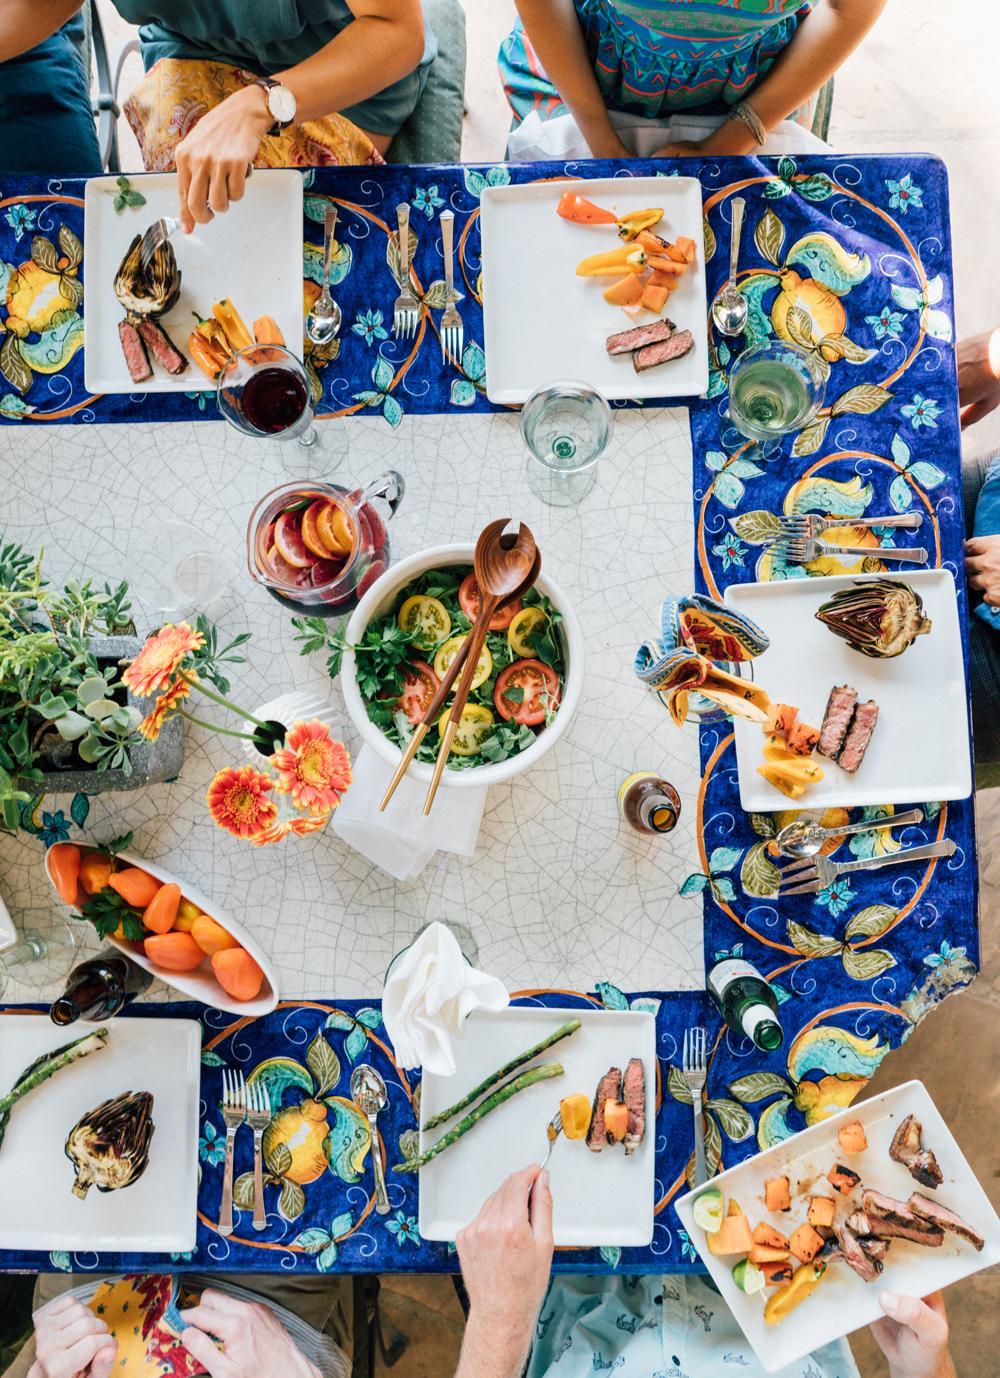 Backyard BBQ - Class Photos - image 10 - student project